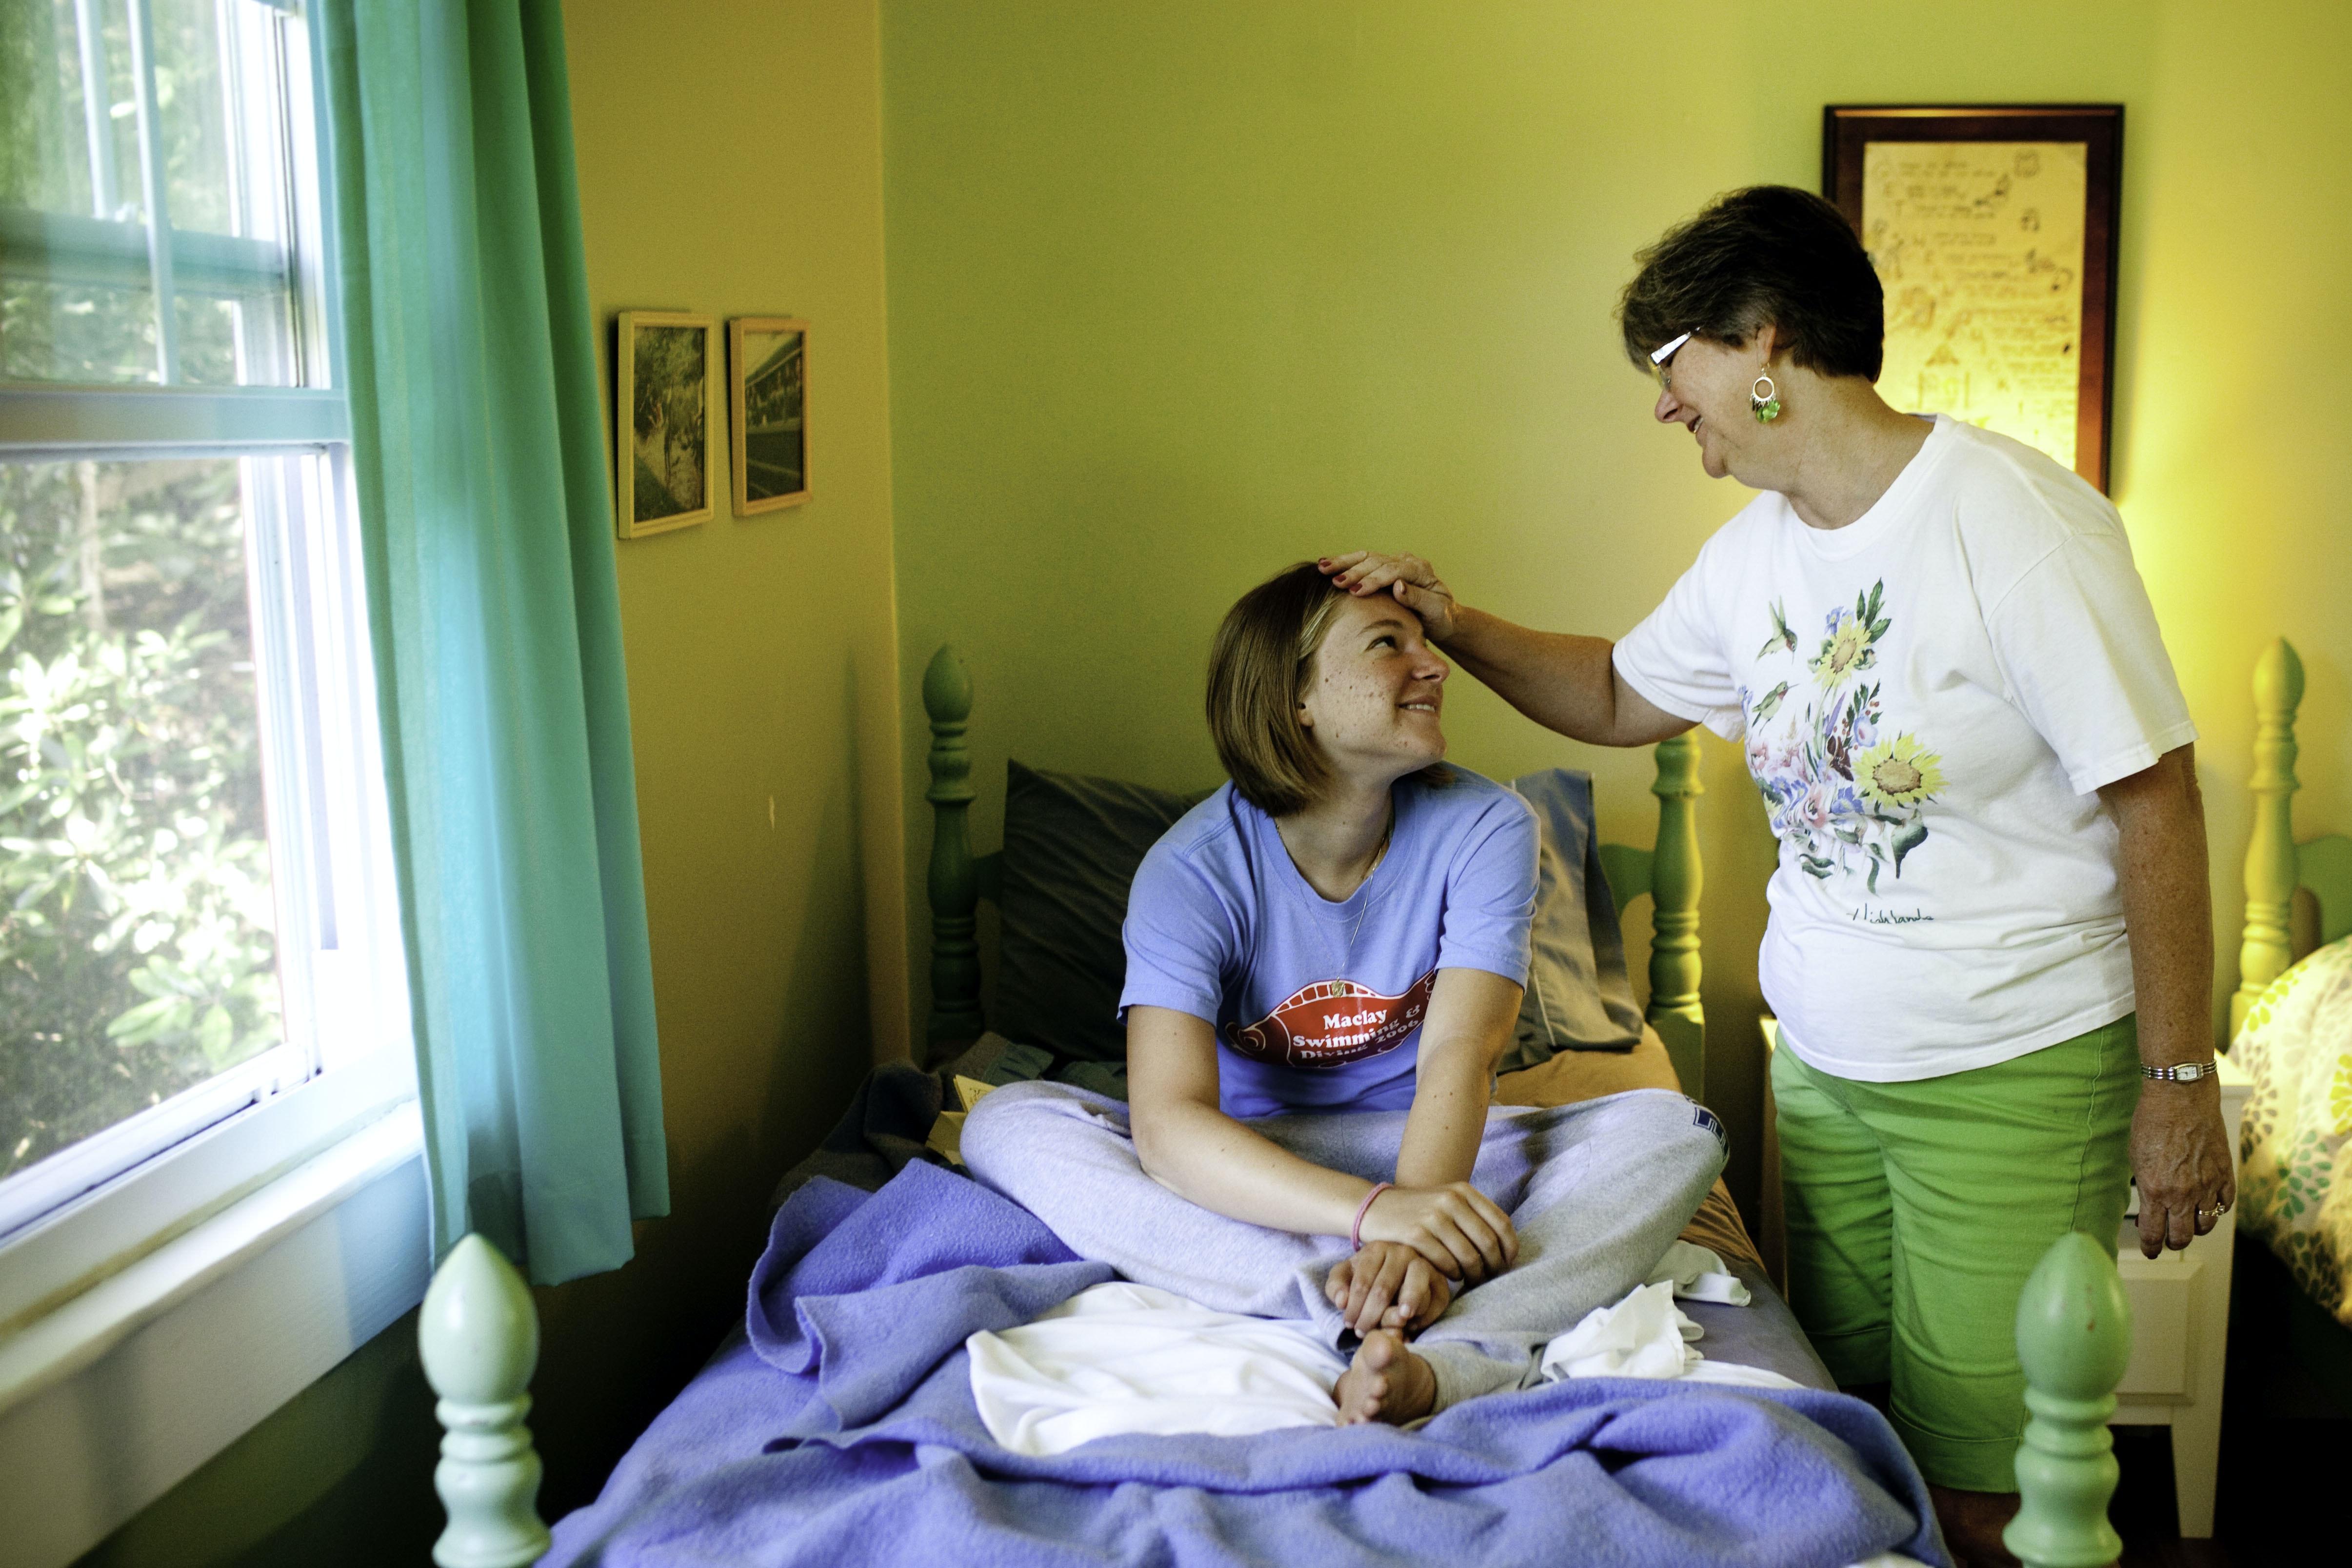 Health at keystone summer camp for girls in north carolina.jpg?ixlib=rails 2.1